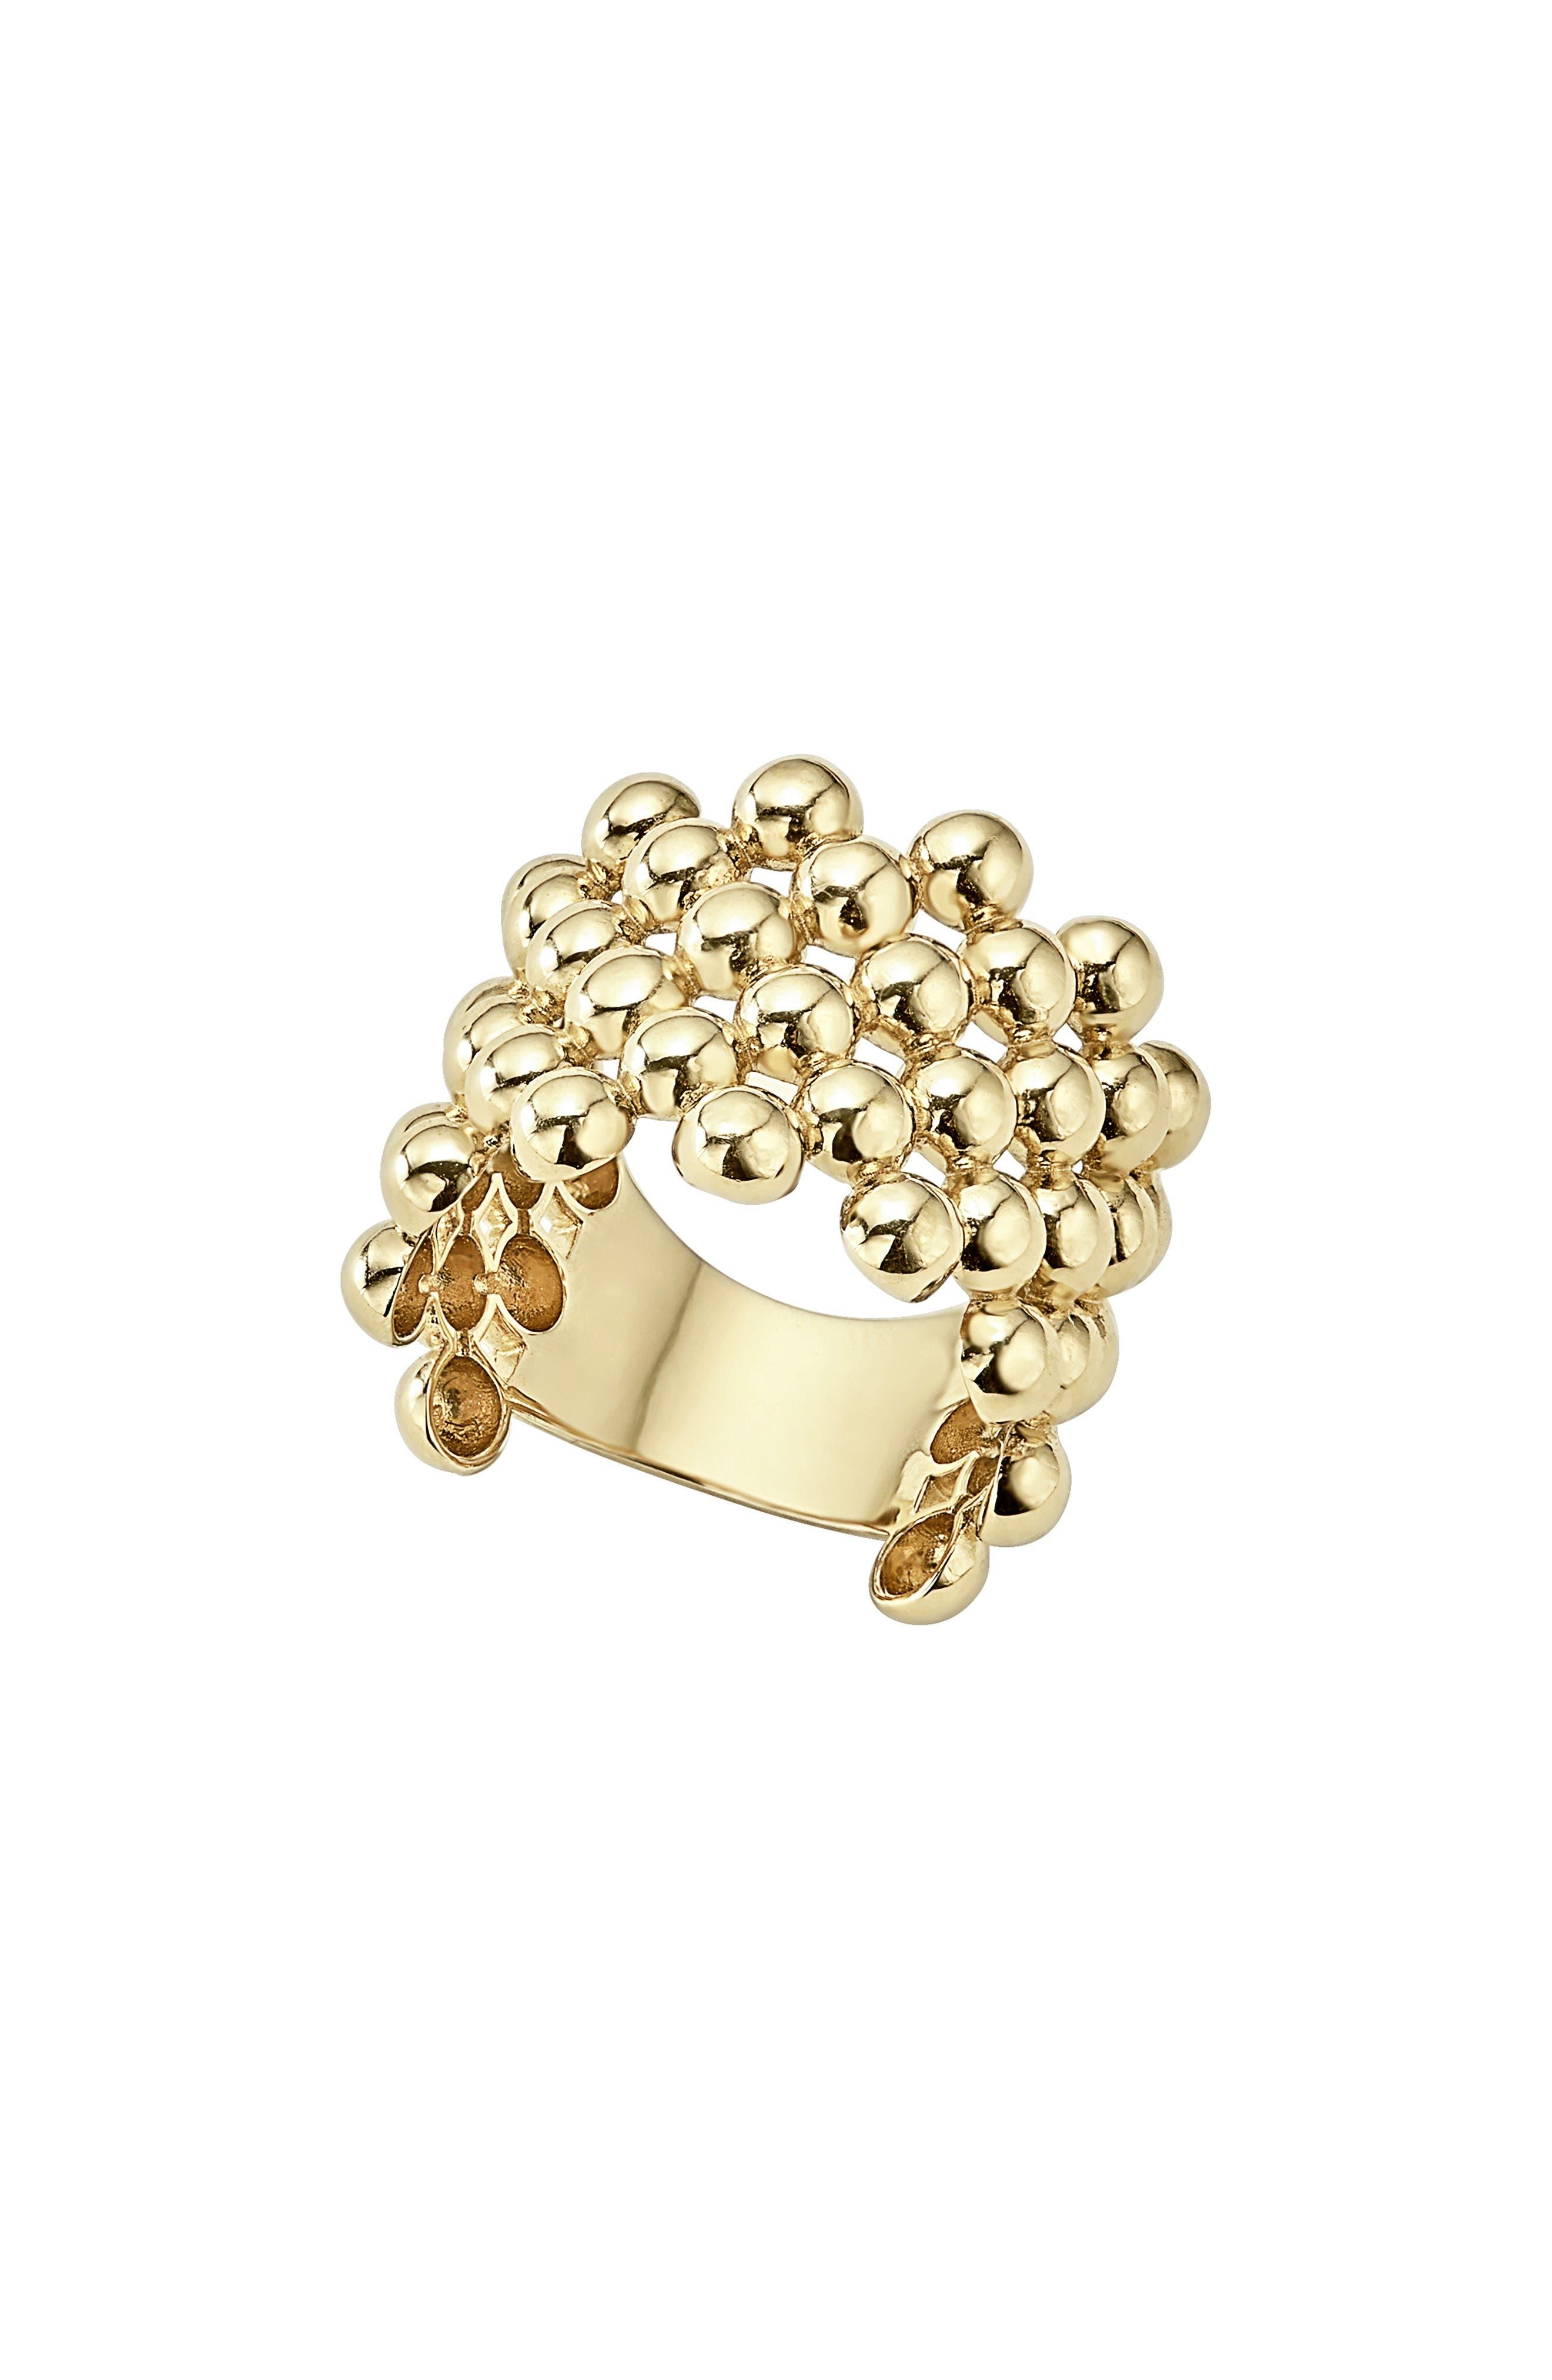 Caviar Gold Wide Band Ring,                             Main thumbnail 1, color,                             GOLD